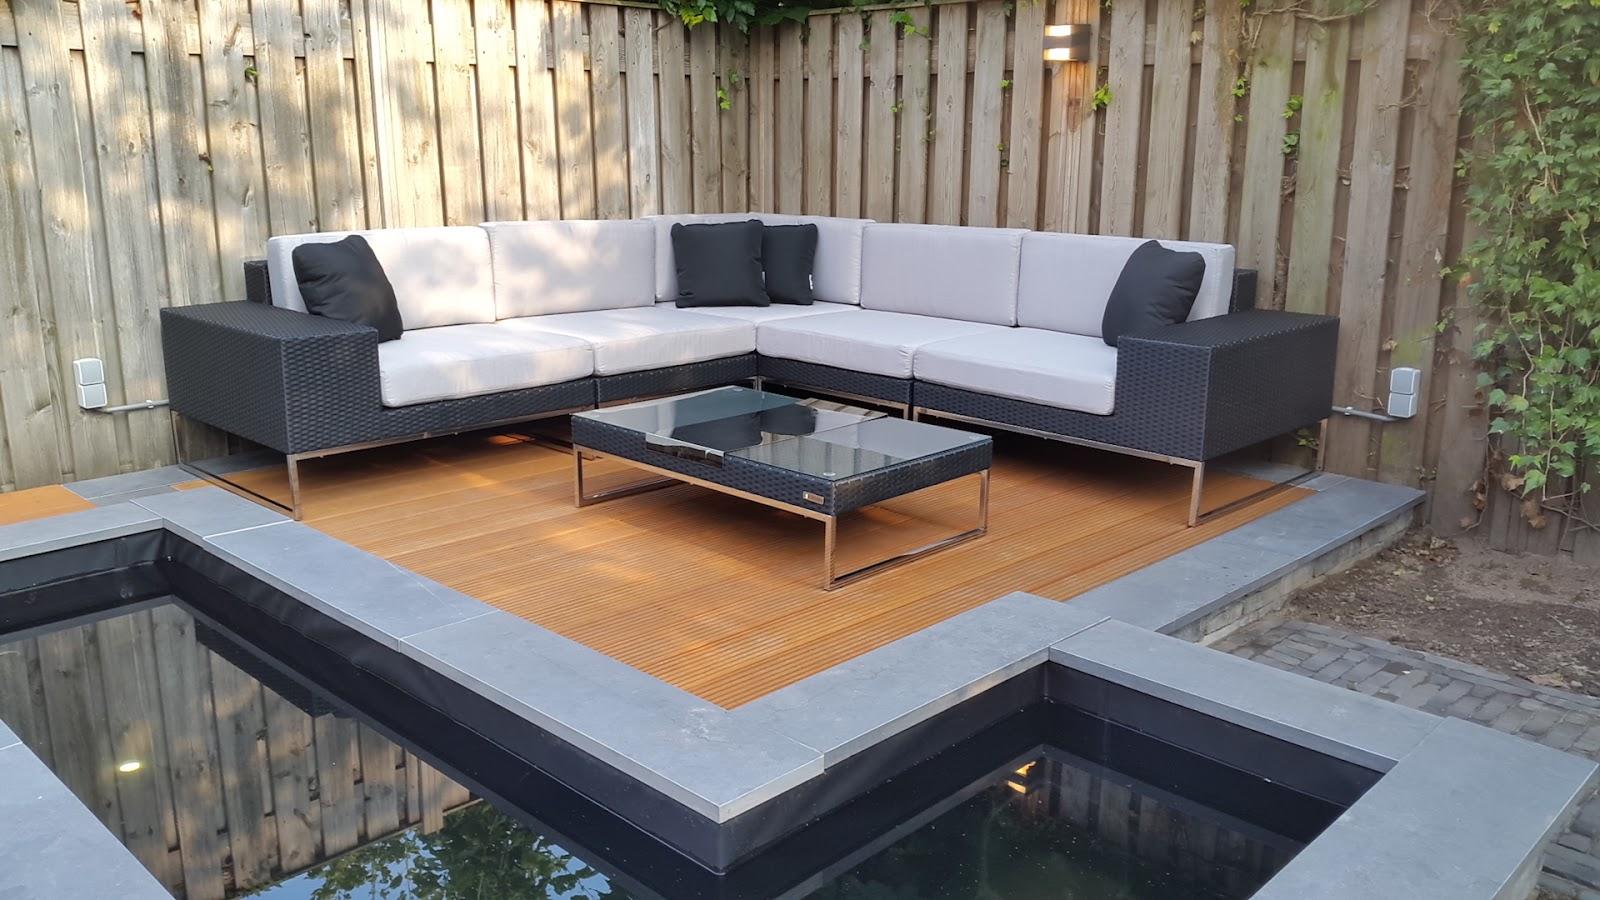 Arbrini design tuinmeubelen: loungeset lineo zwart wicker met rvs